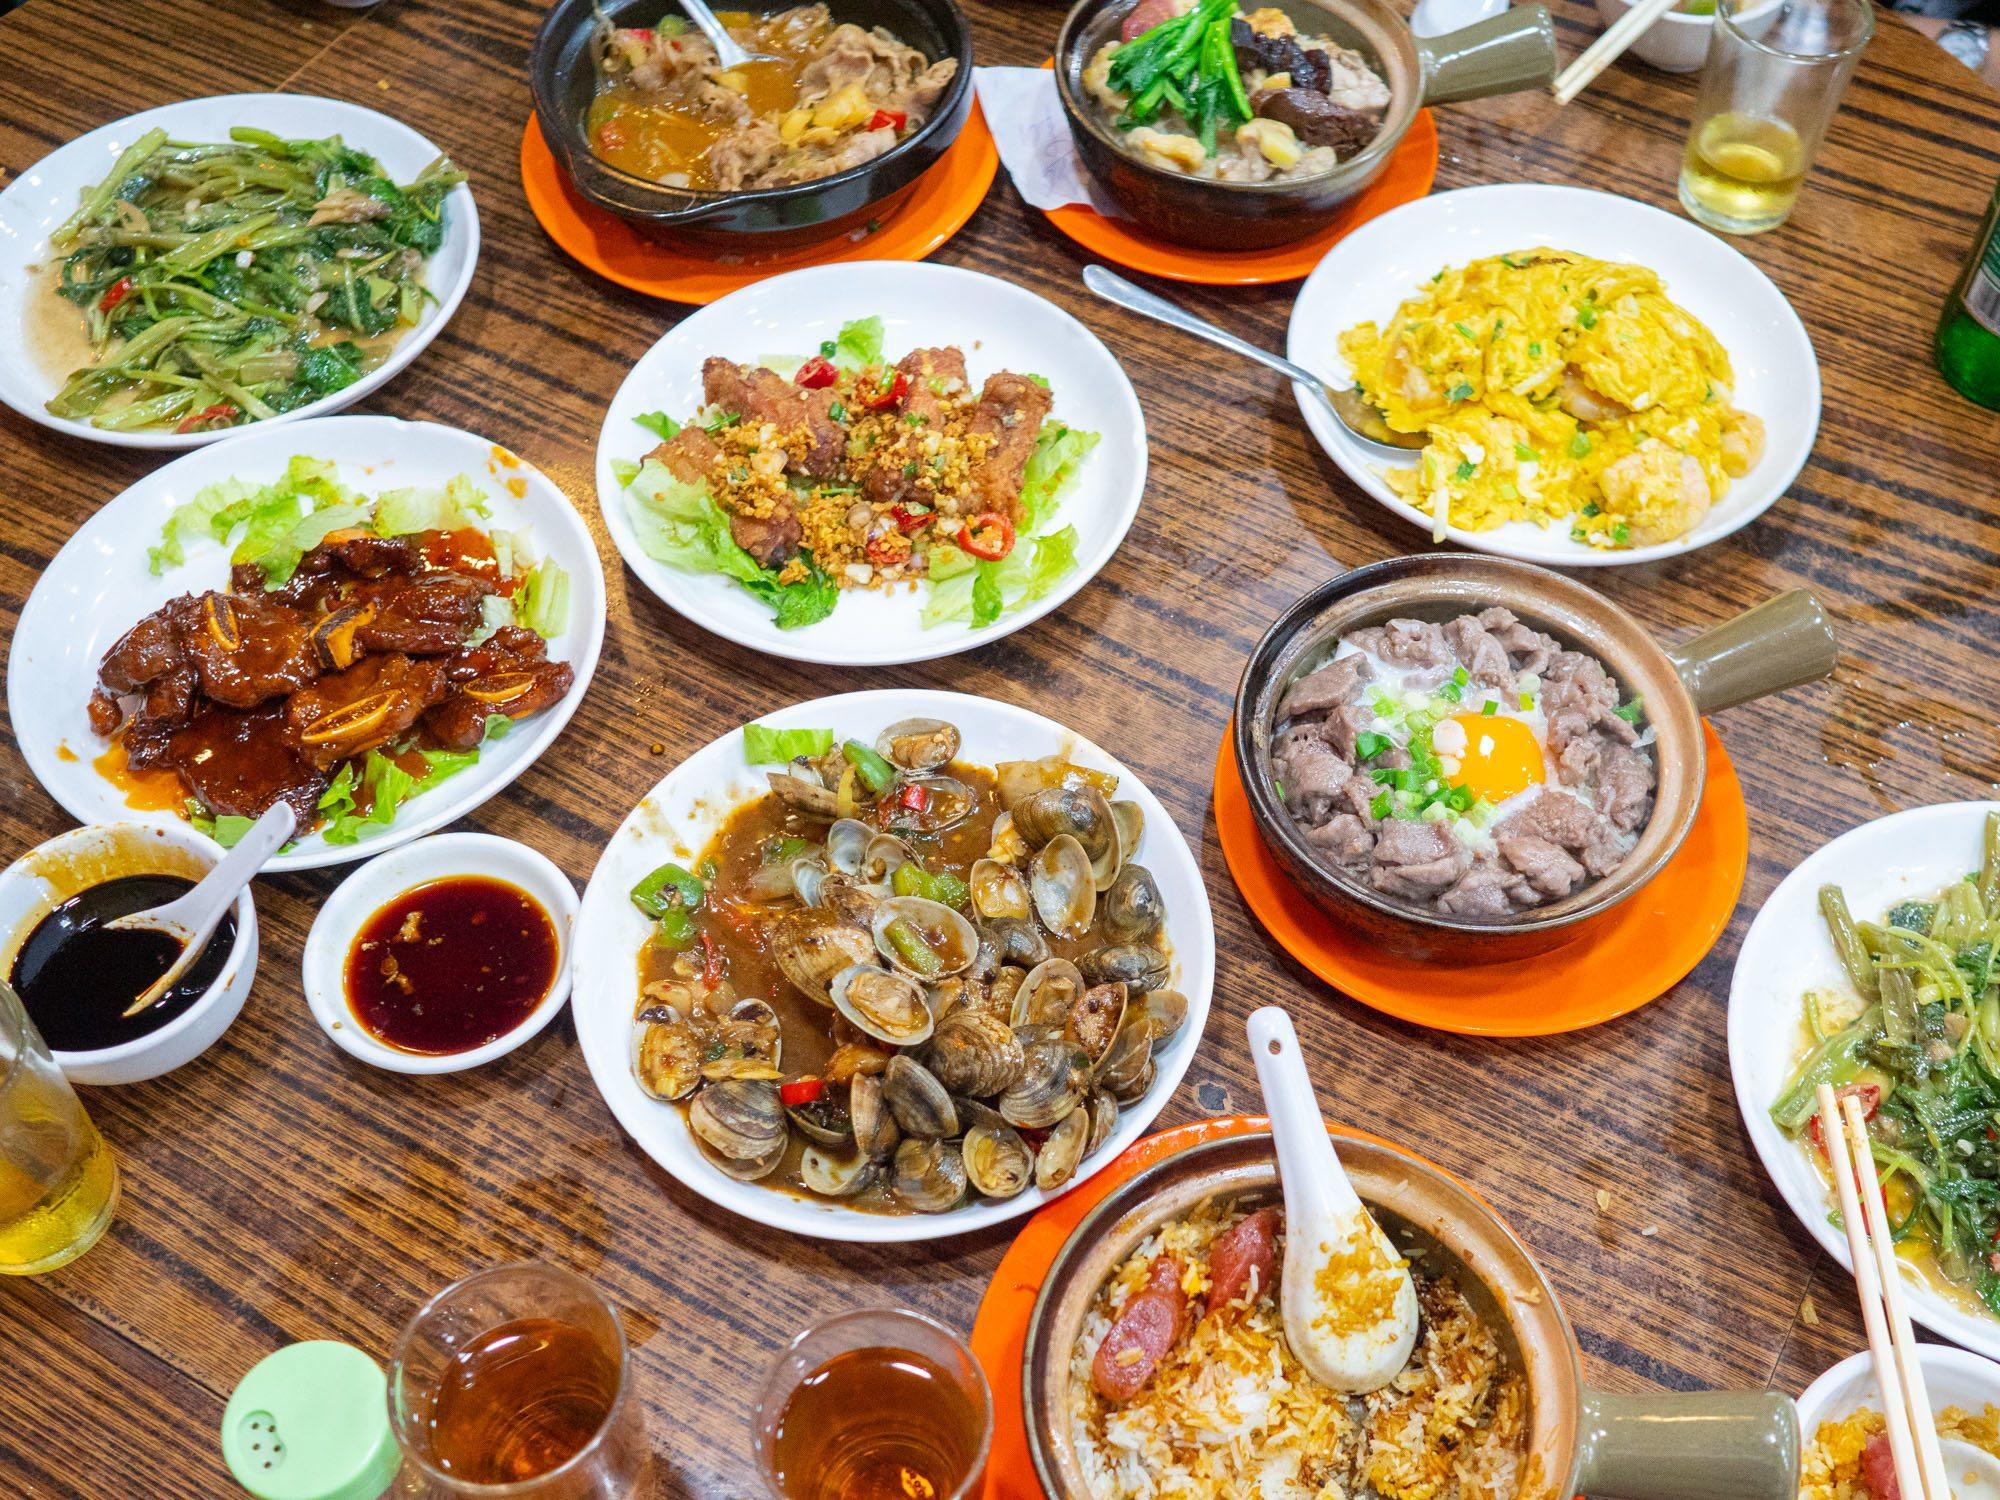 Cantonese food at kwan kee claypot rice